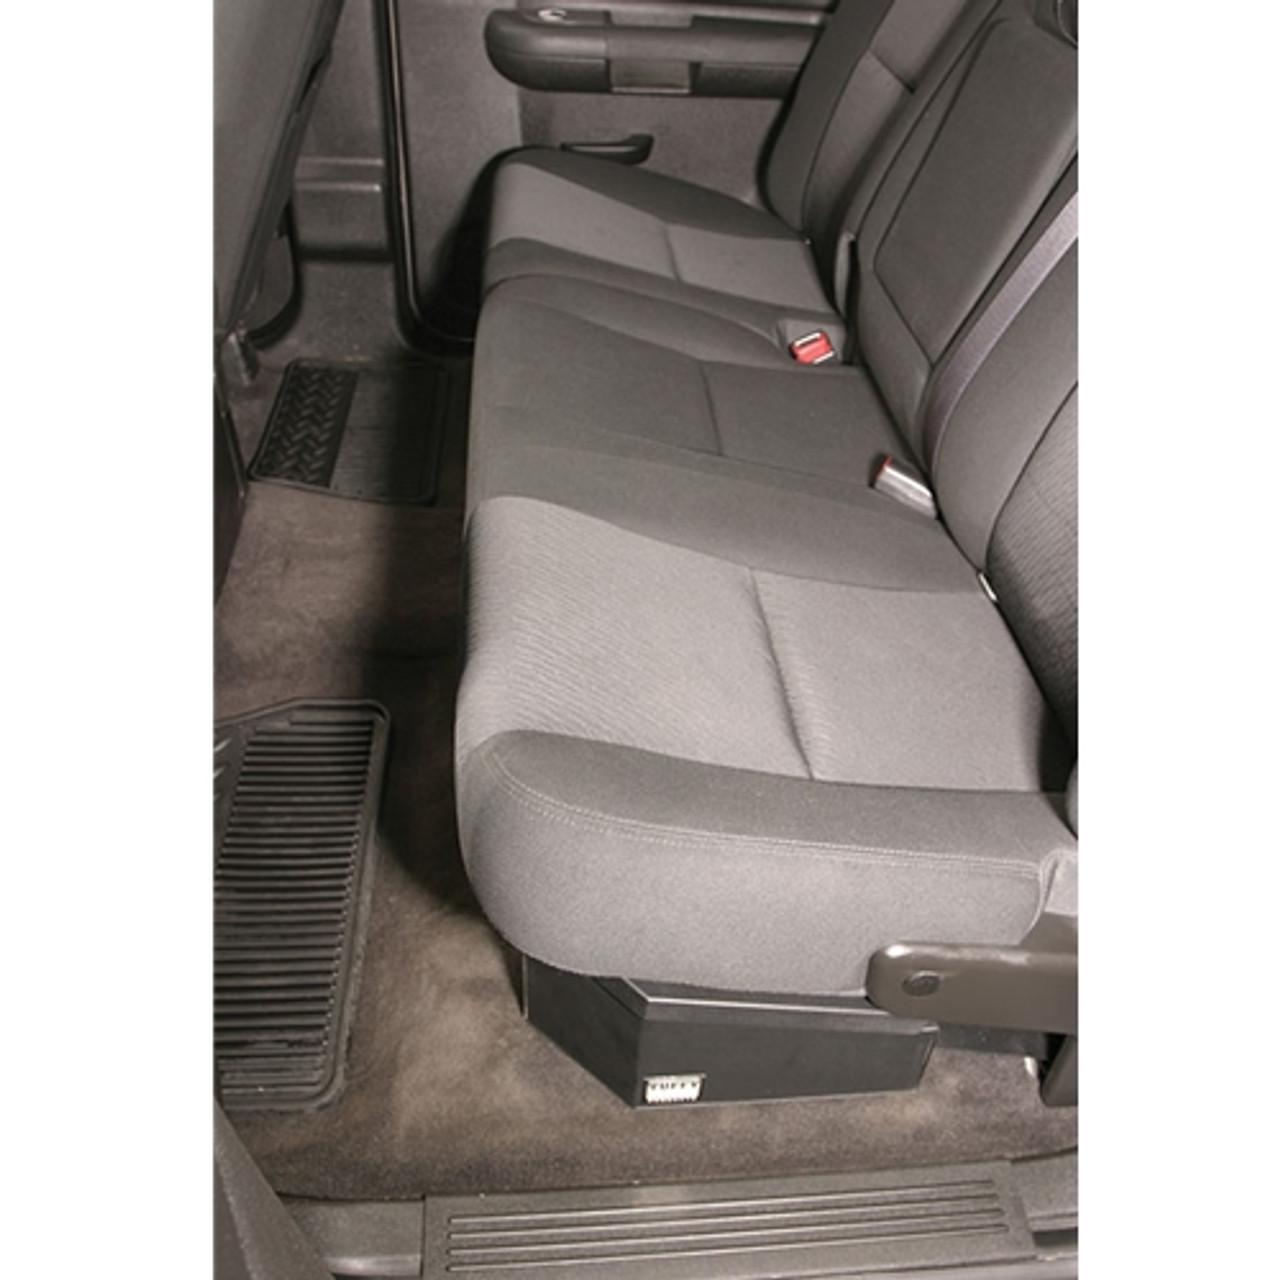 Chevy Silverado Rear Seat Storage Organizer Lock Box